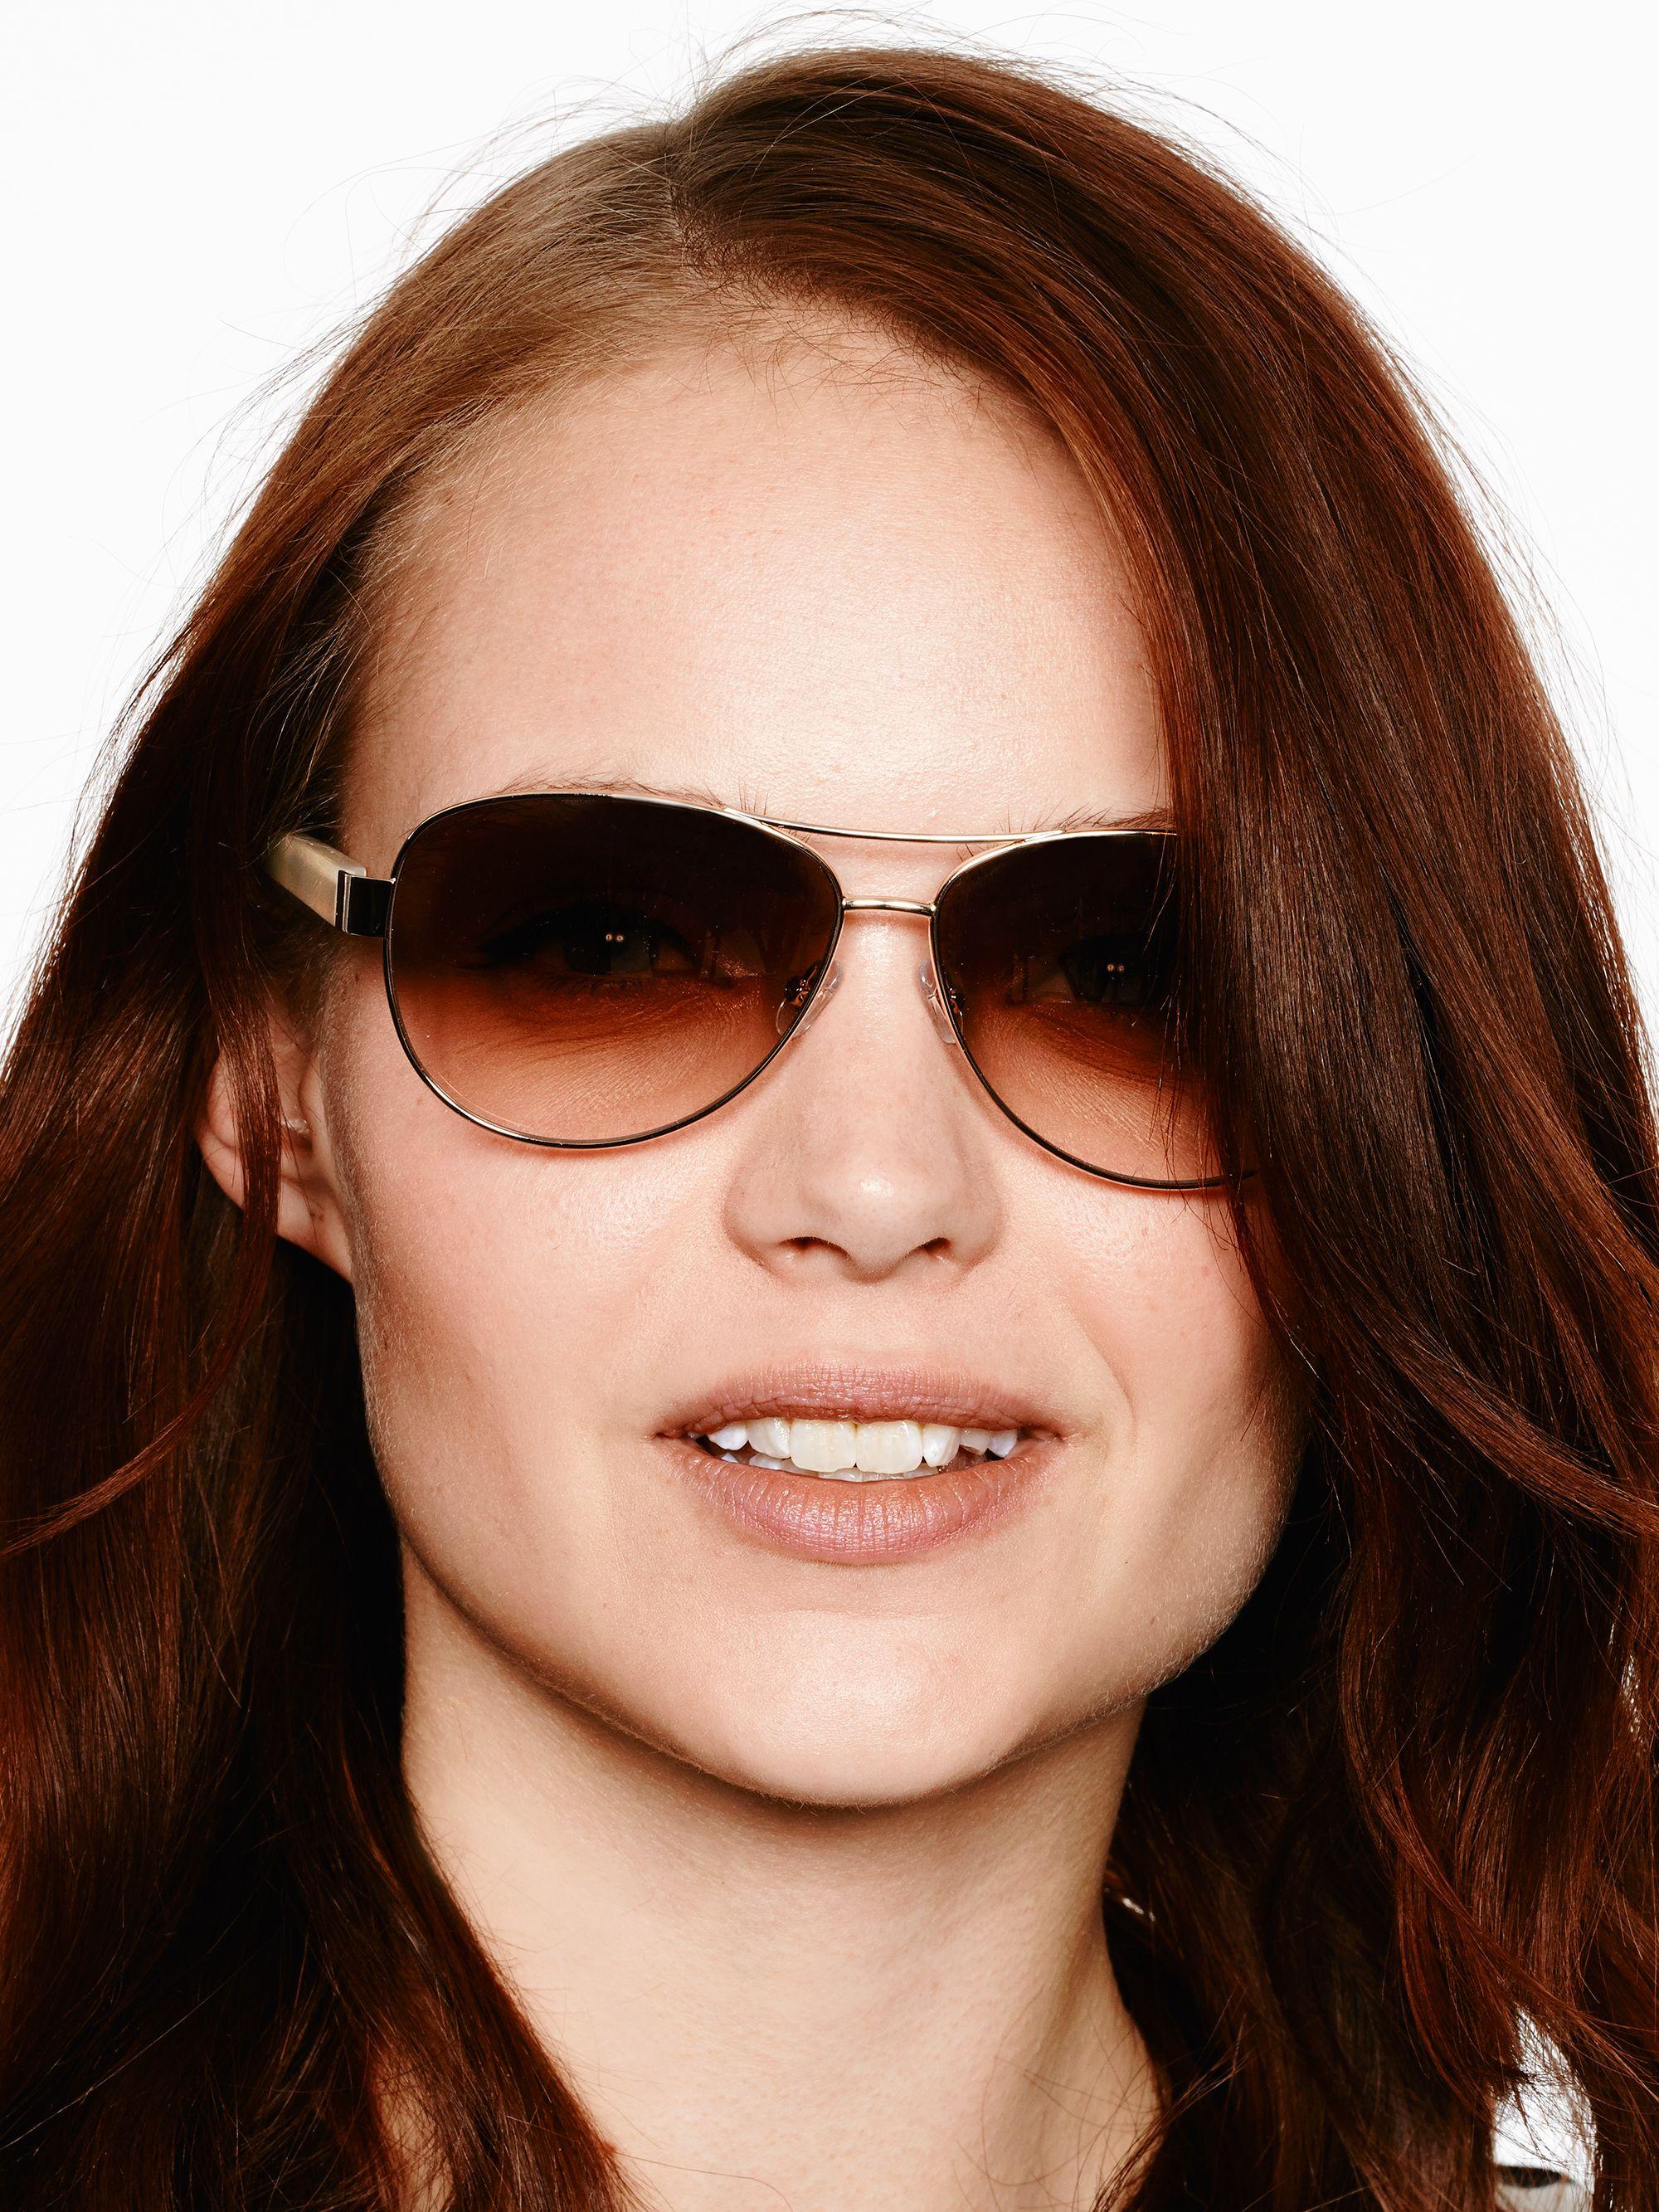 00deb0c2c1 Lyst - Kate Spade Dalia Sunglasses in Metallic